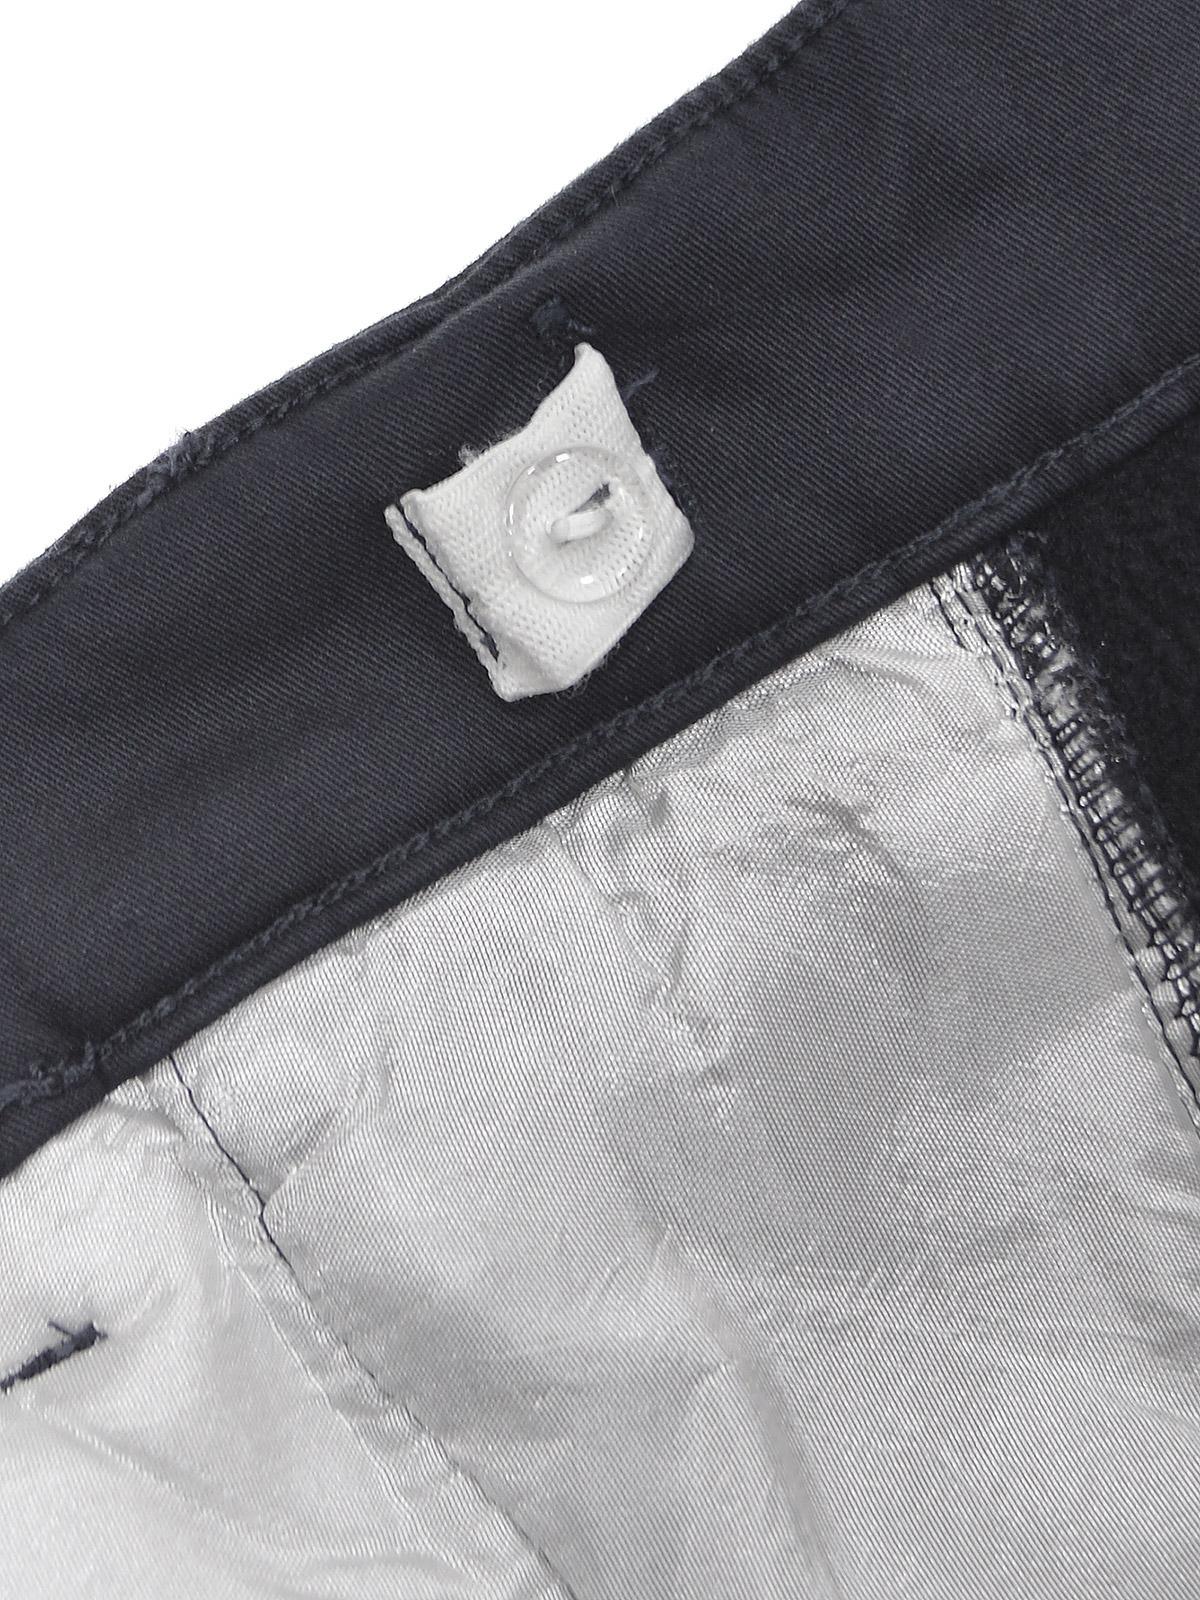 Enfants-Chino-THERMO-d-039-hiver-Pantalons-Garcons-Pantalon-Doublure-Stretch-Reglable-22904 miniature 10